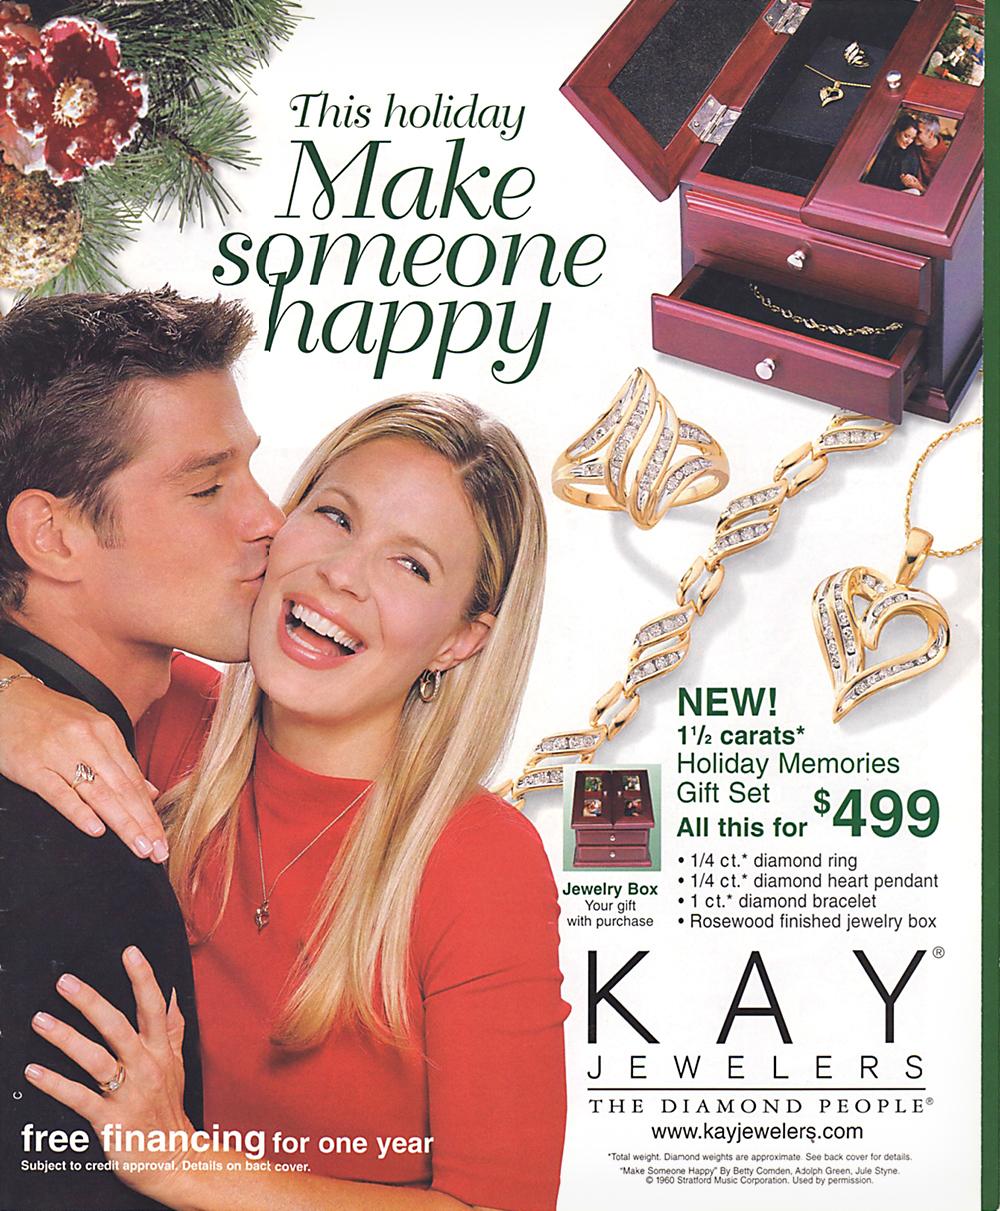 KAY-XMAS-Couple-Cover.jpg